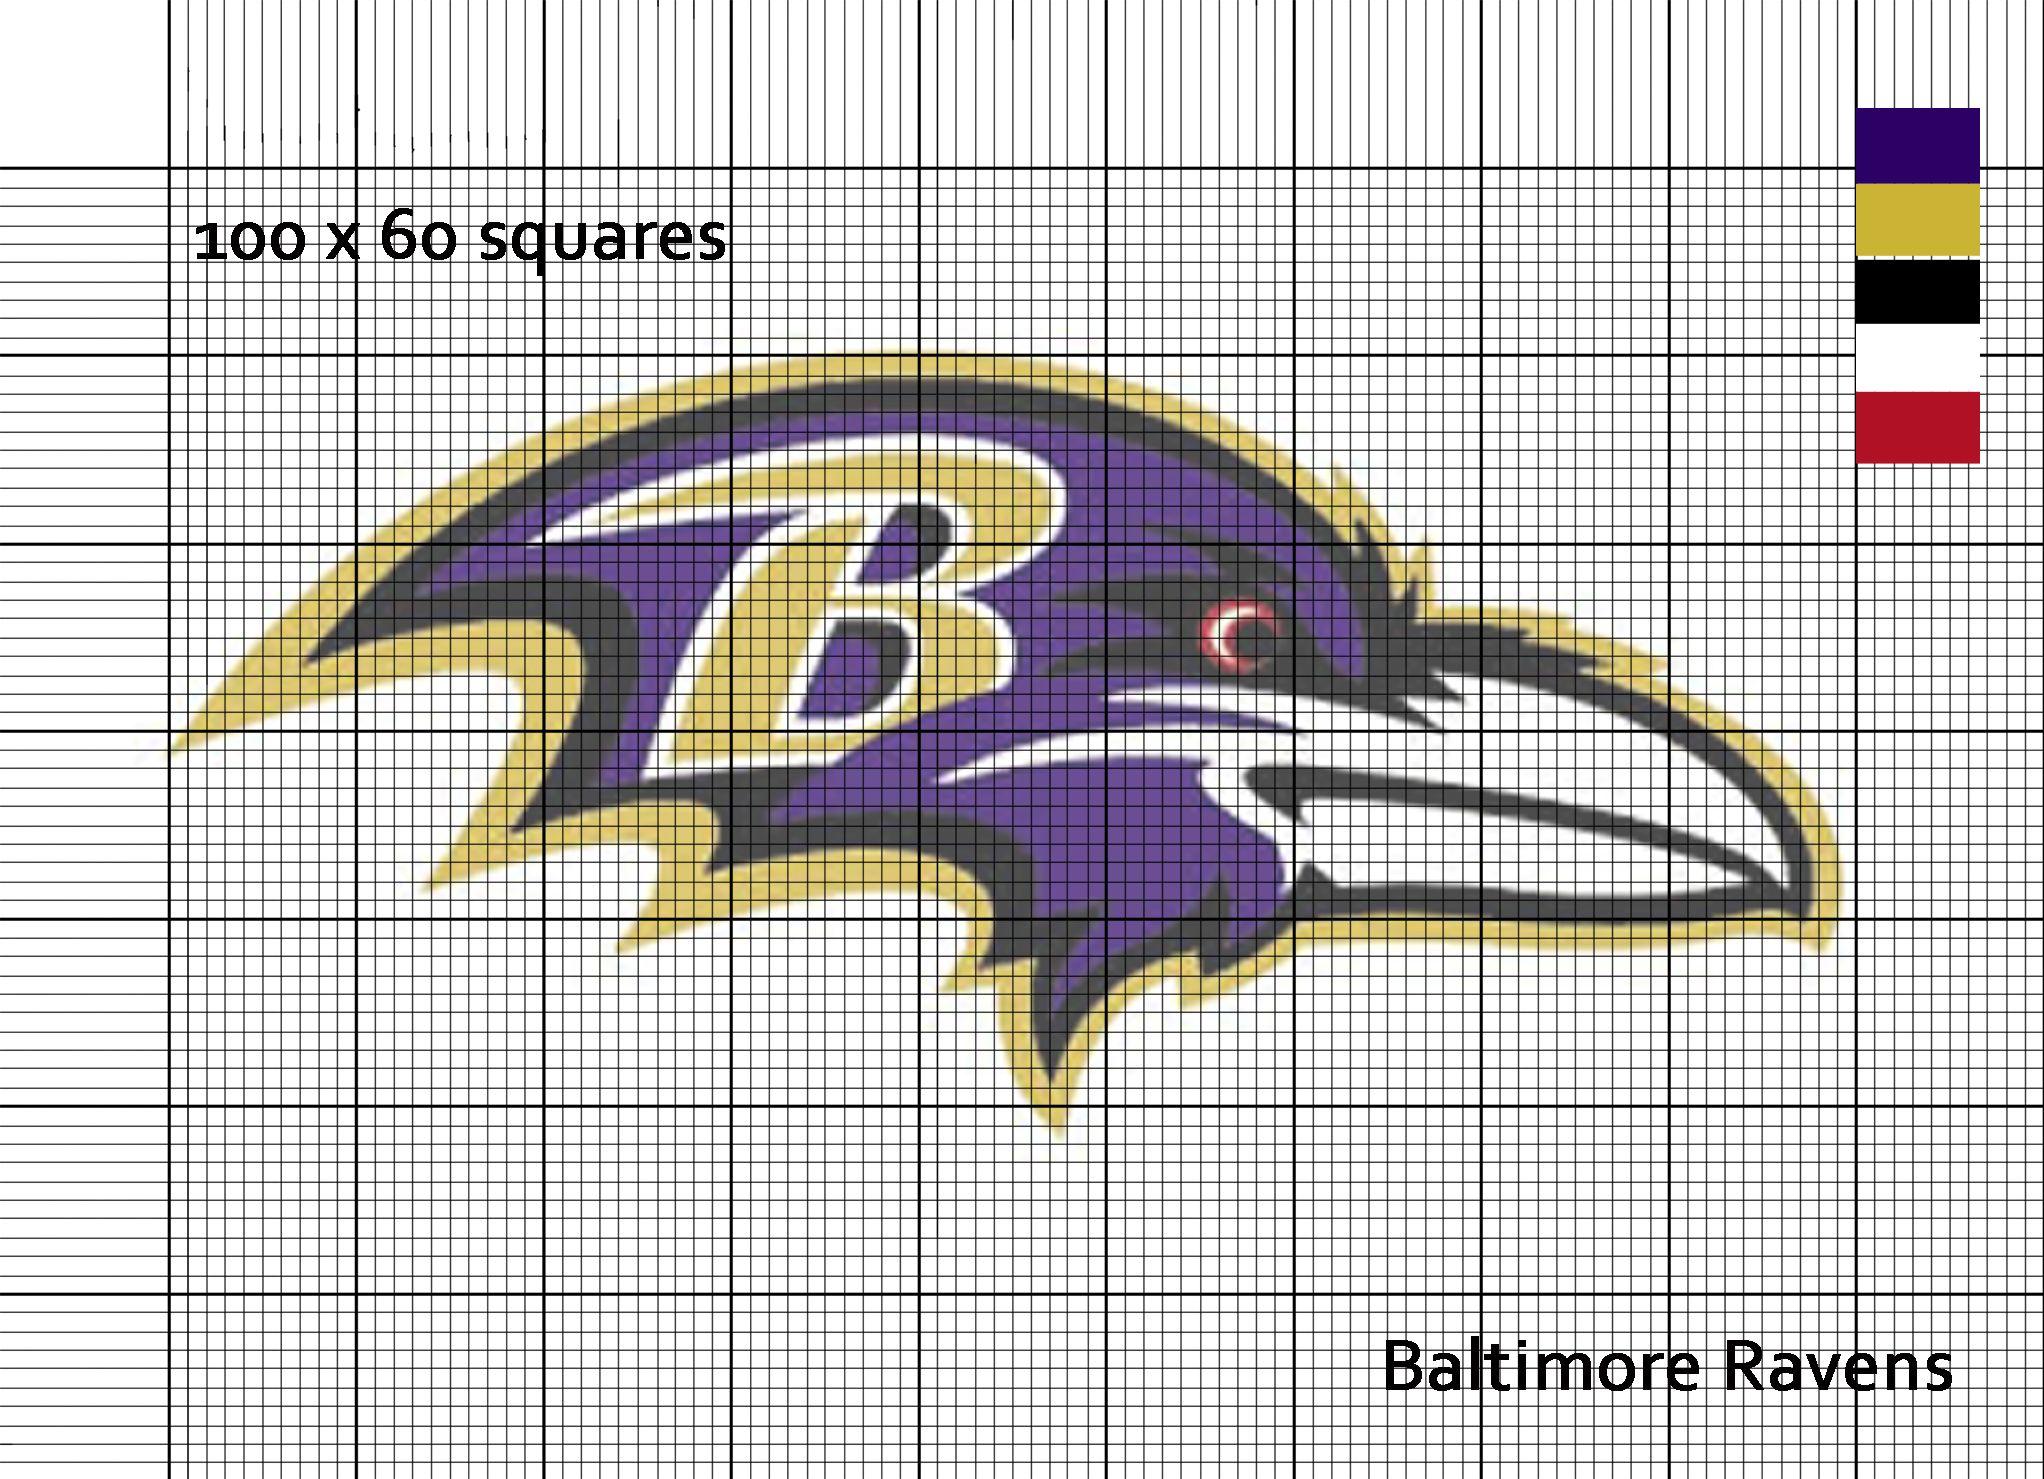 Baltimore Ravens Nfl Logo Cross Stitch Pattern Sweet Cross Stitch Cross Stitch Patterns Cross Stitching